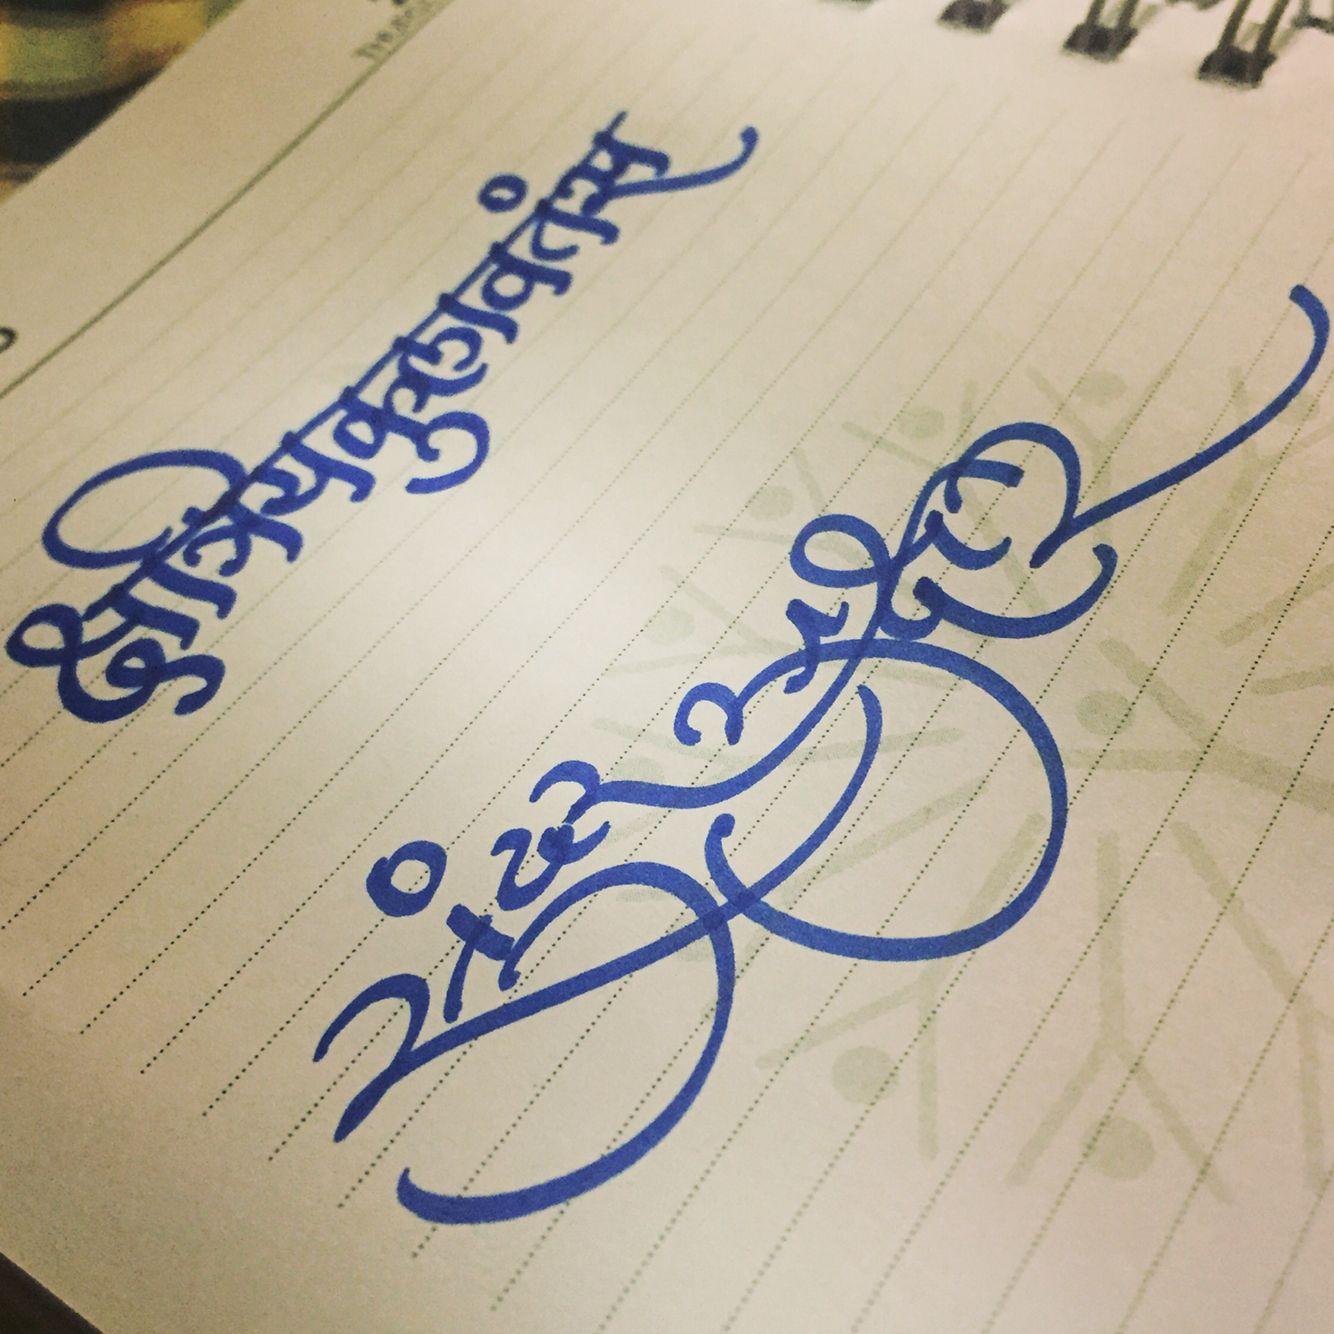 Marathi Calligraphy   Calligraphy by Vishant Chandra in 2019